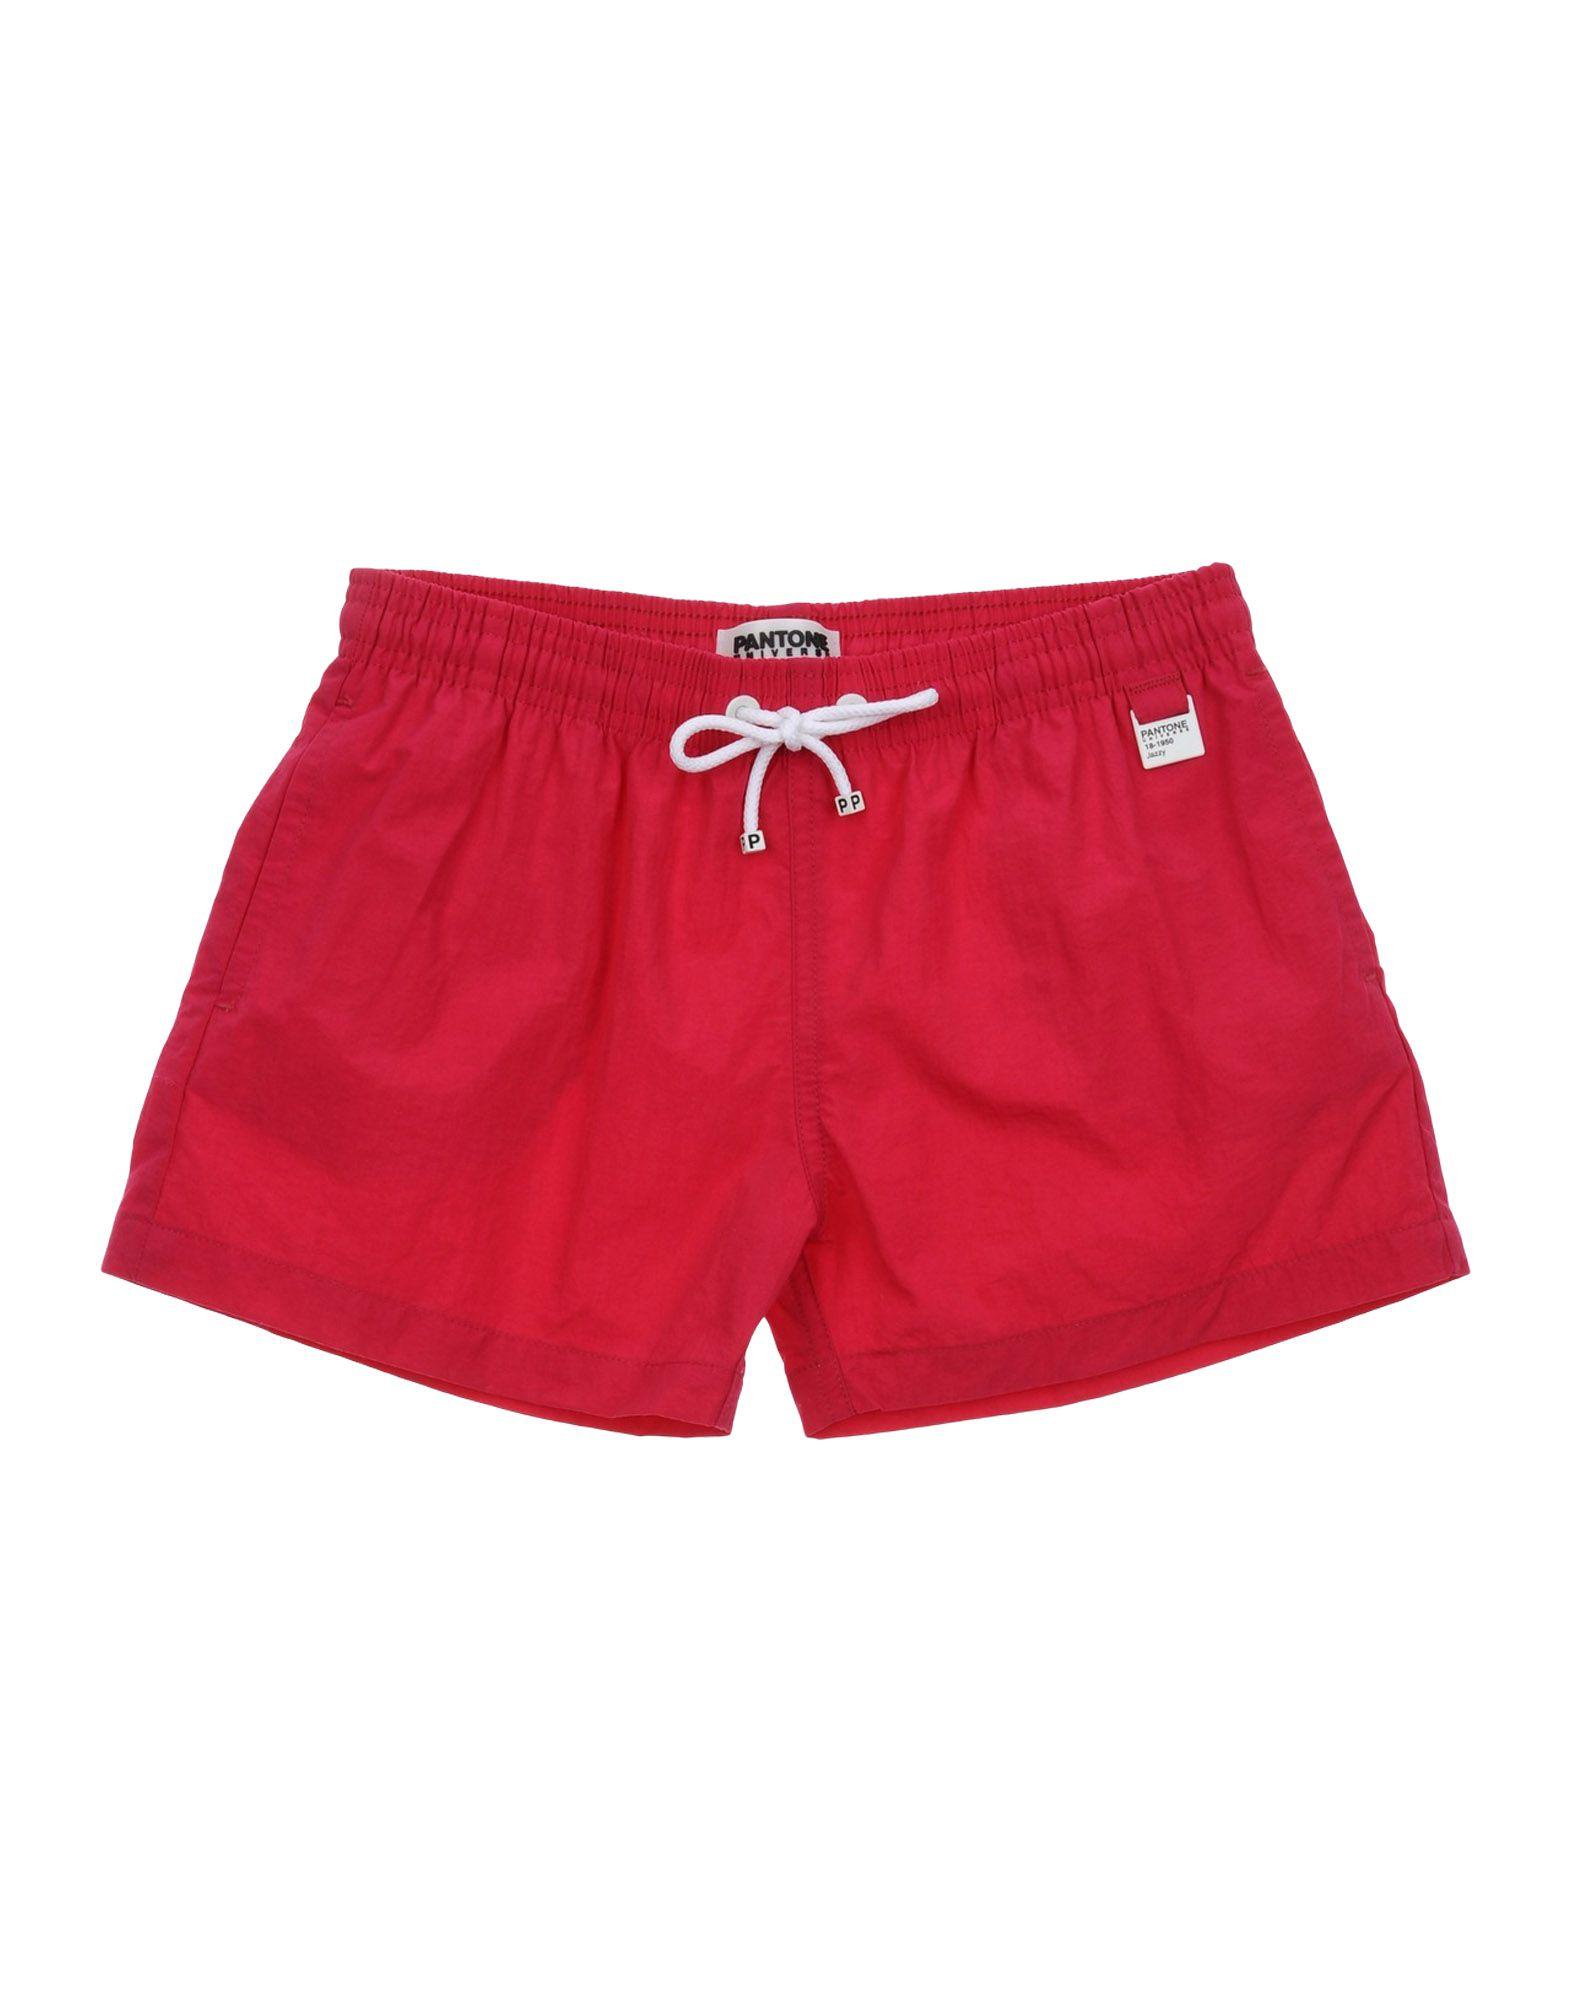 PANTONE Swim trunks